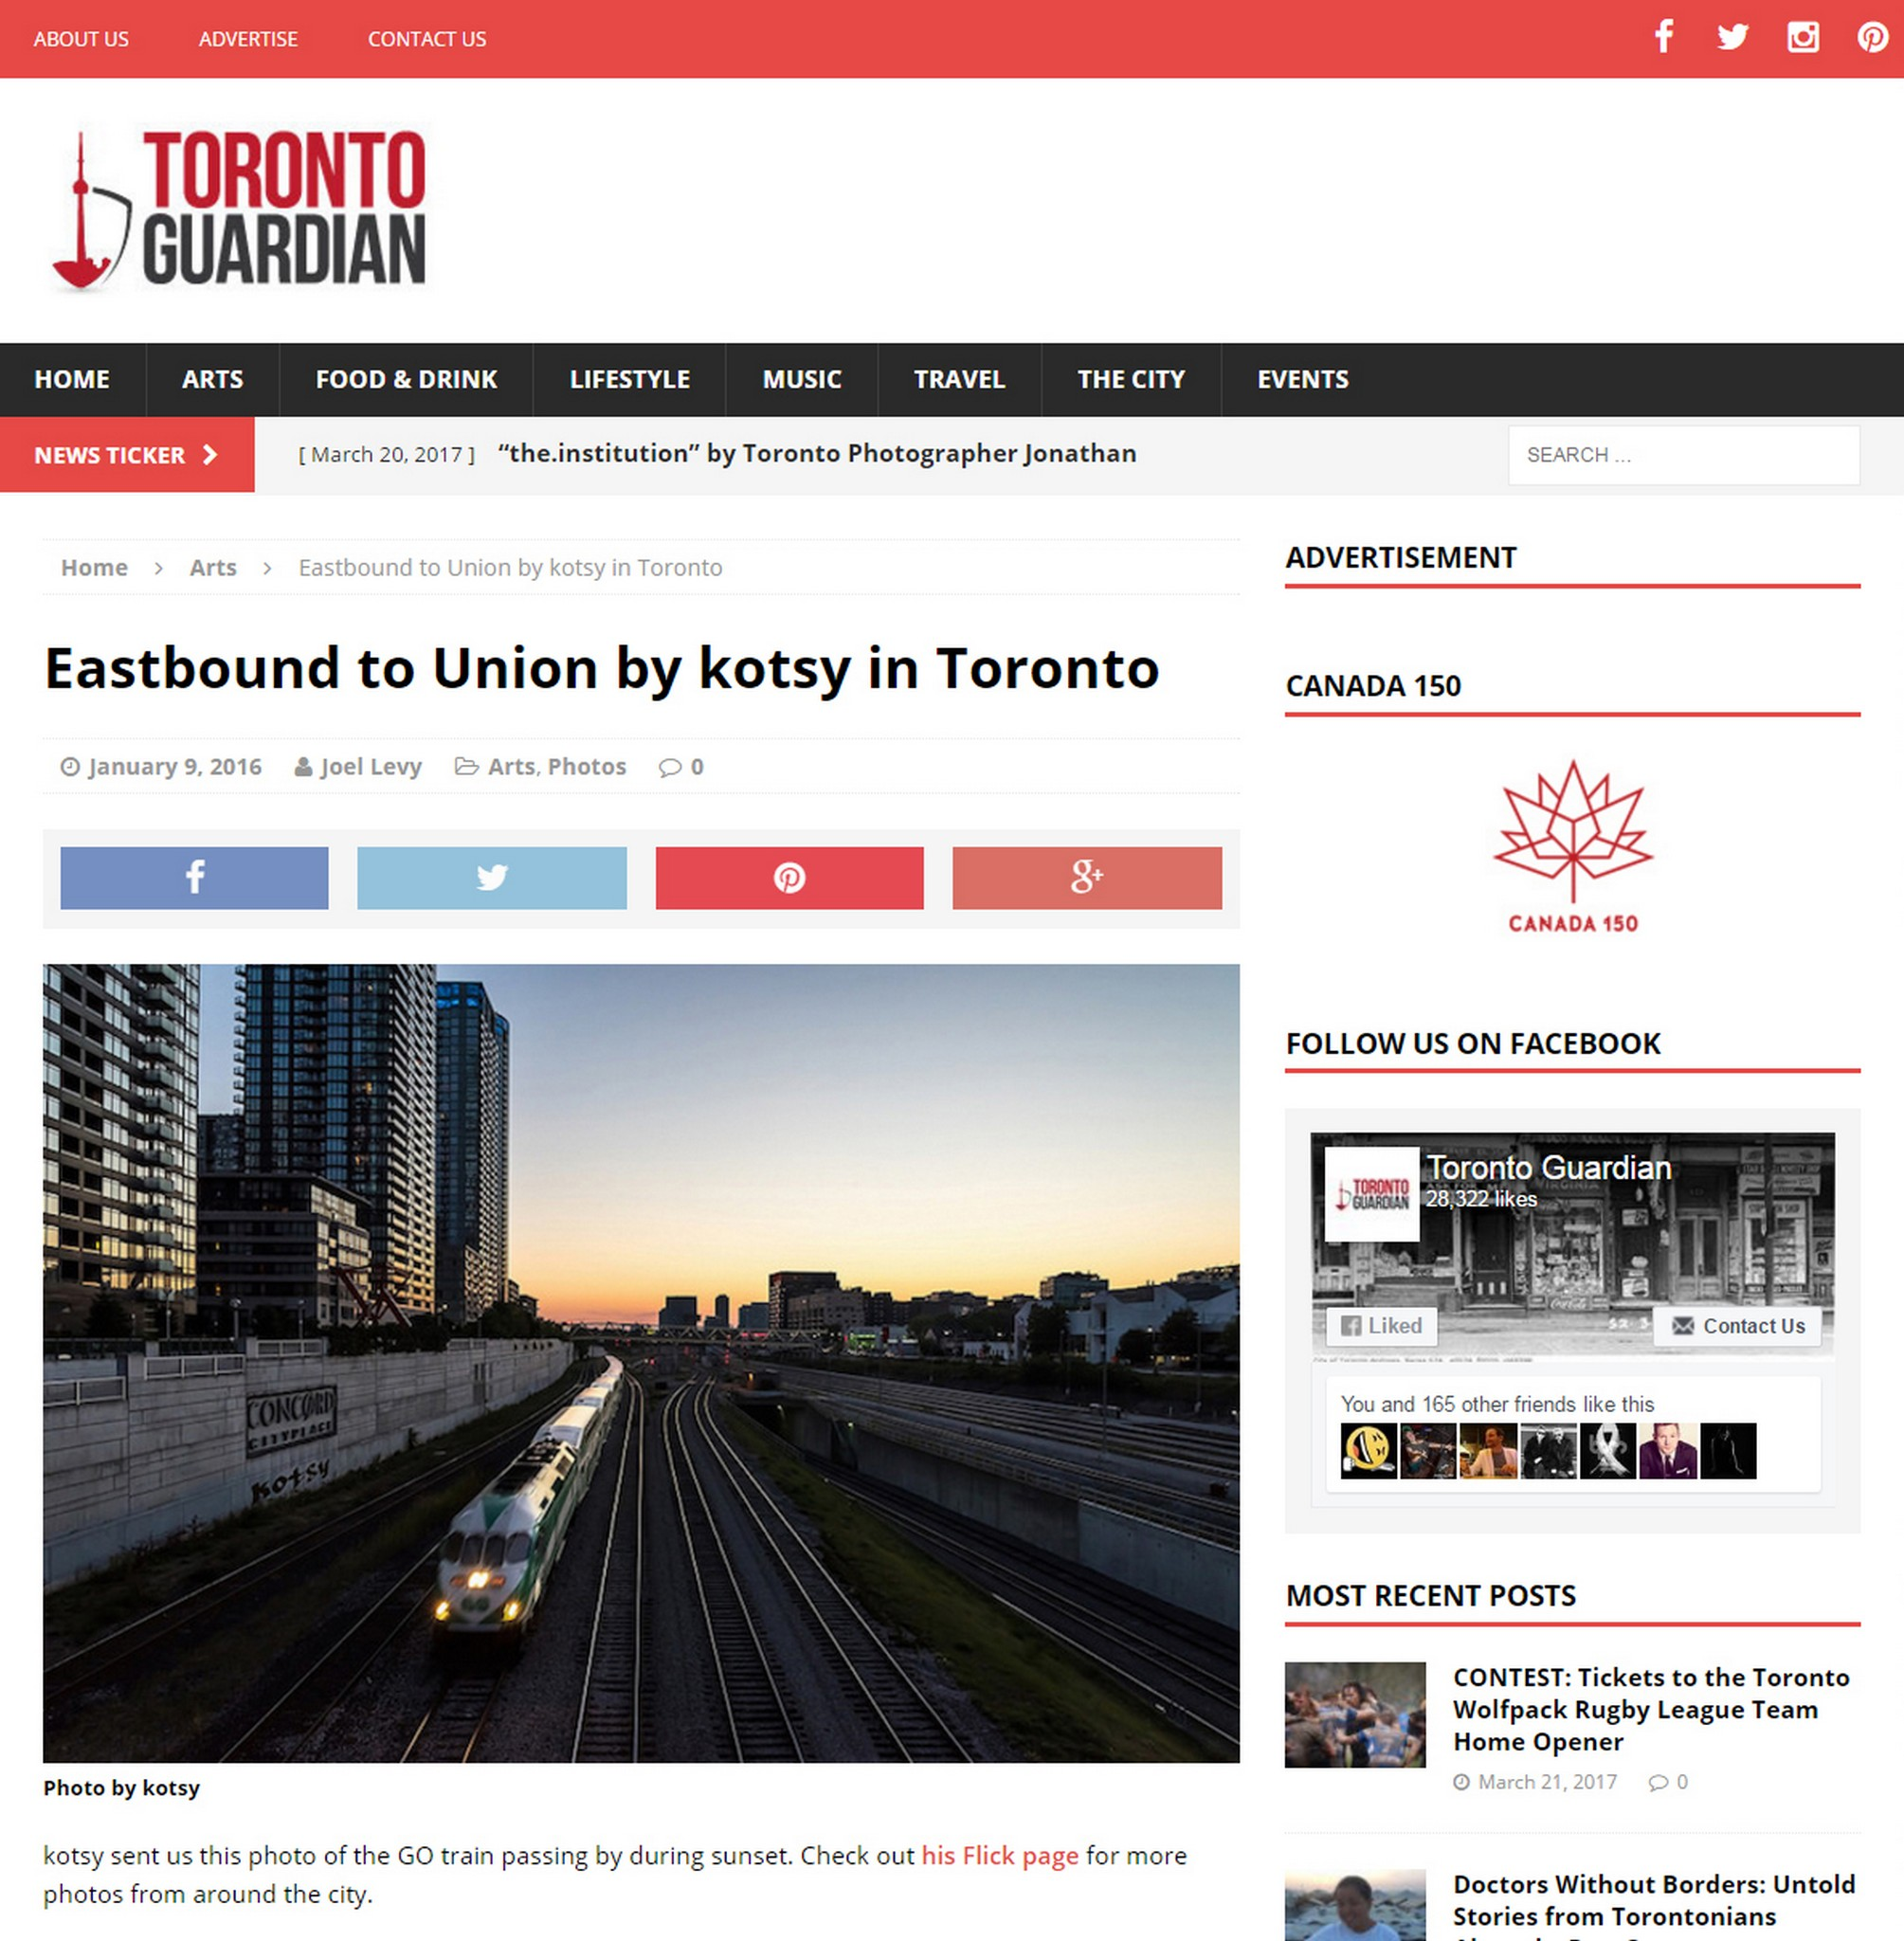 2016-01-09-Toronto Guardian.jpg